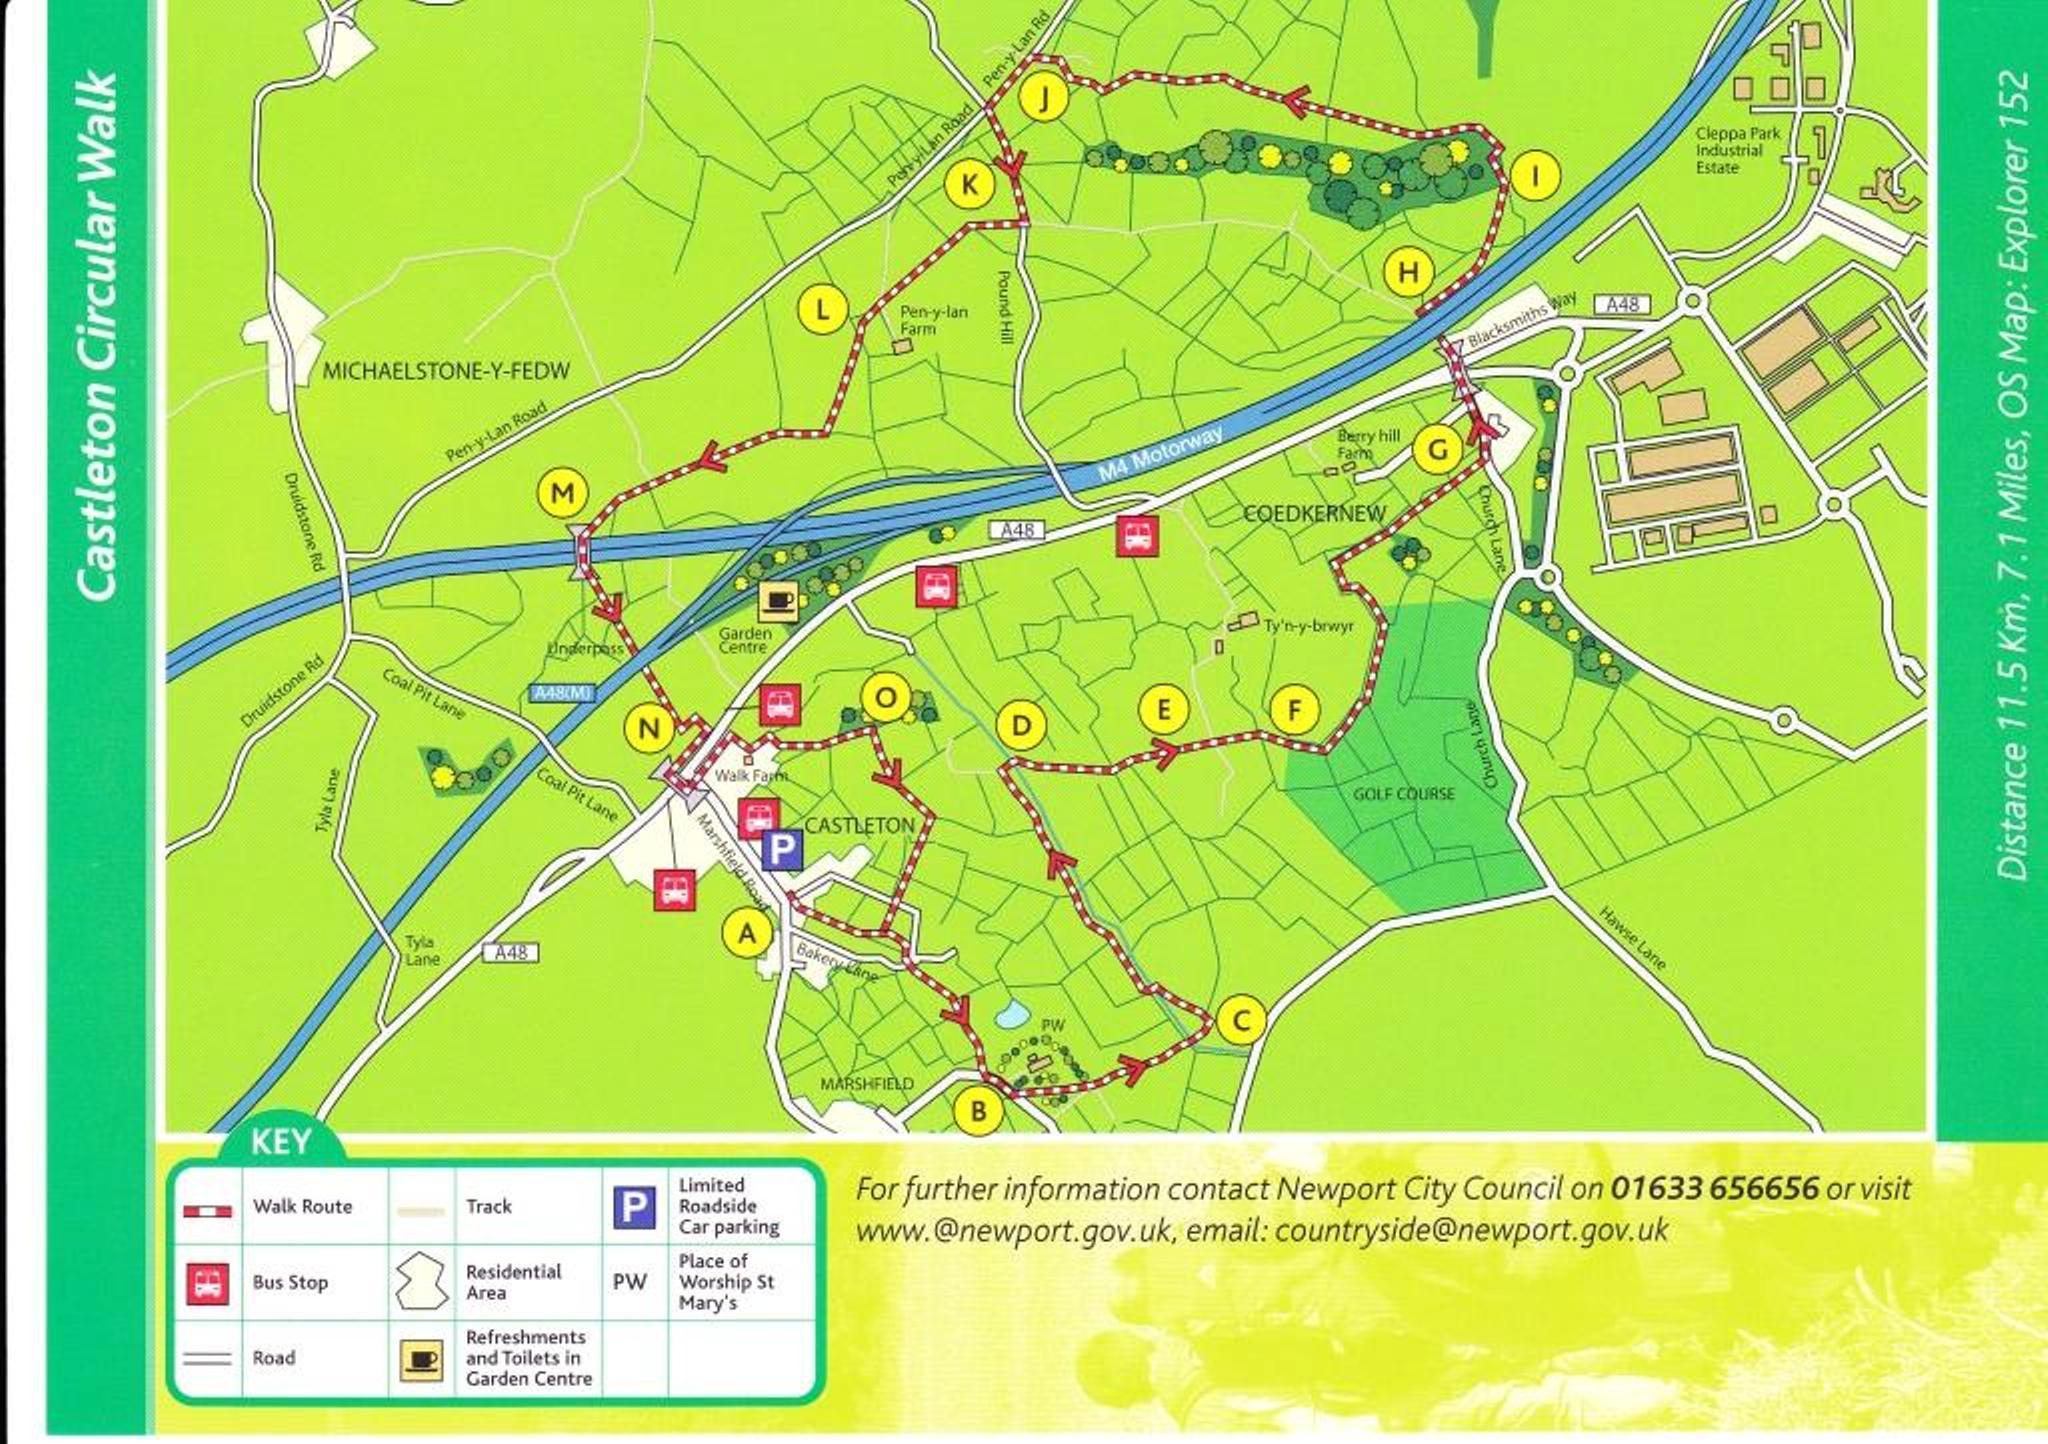 Castleton Circular Walk Marshfield Community Council Serving the